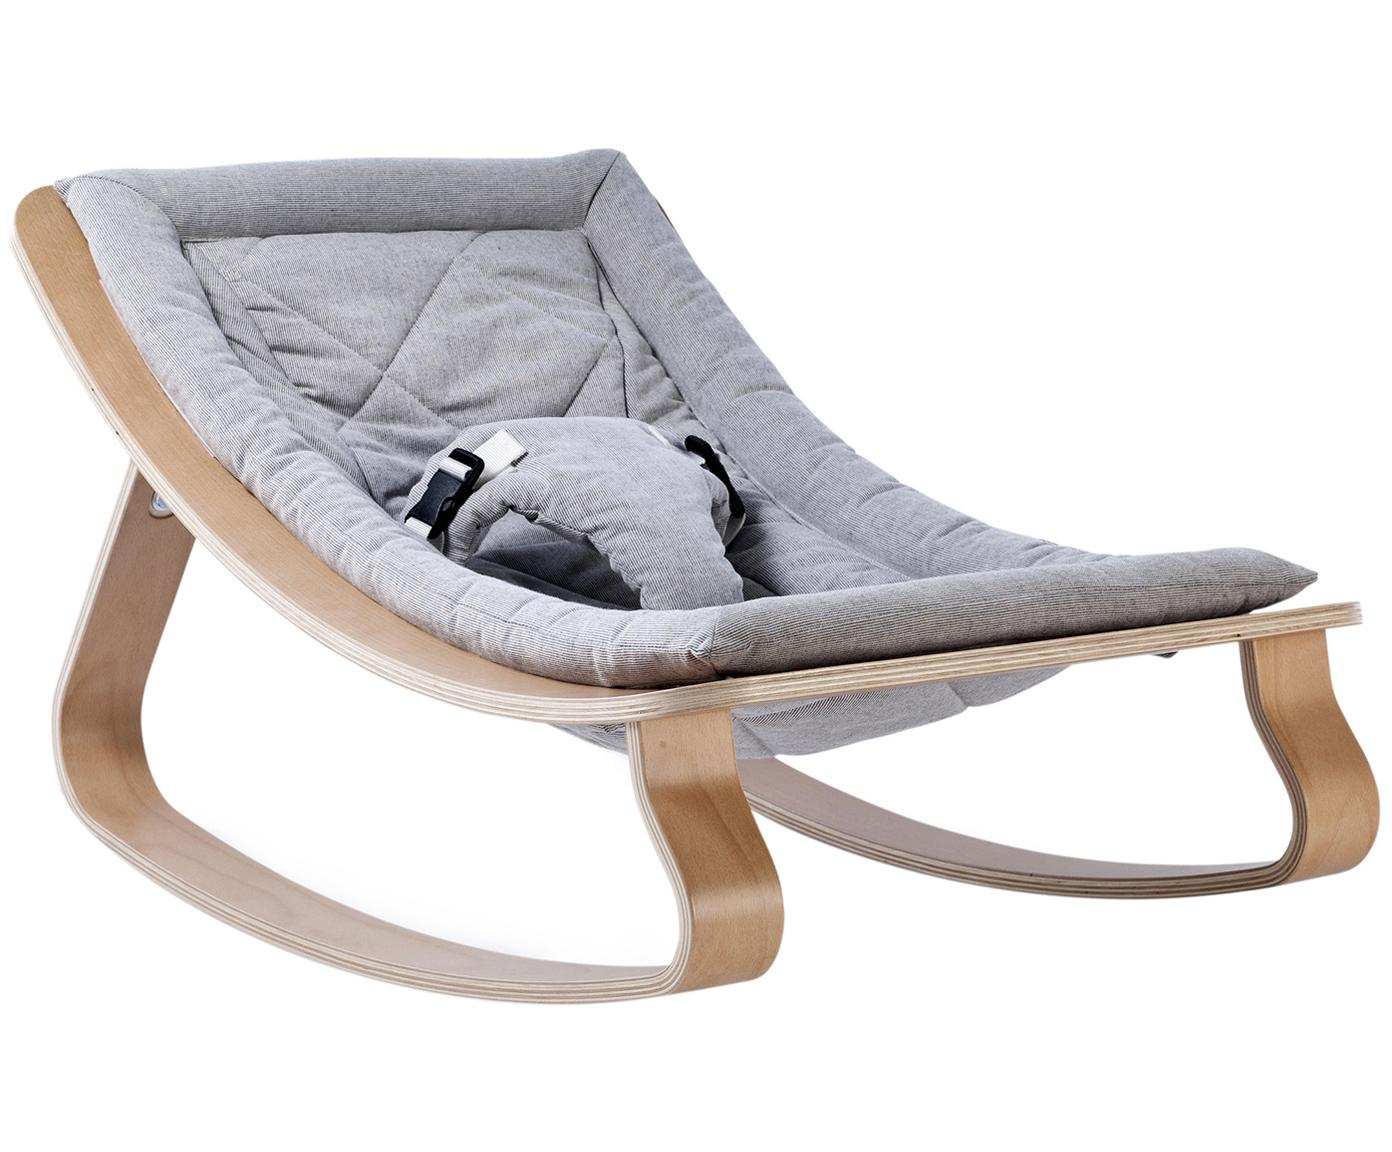 Babywippe Levo, Gestell: Birkenholz, Buchenholz, k, Bezug: Baumwolle, Hellbraun, Grau, 70 x 40 cm